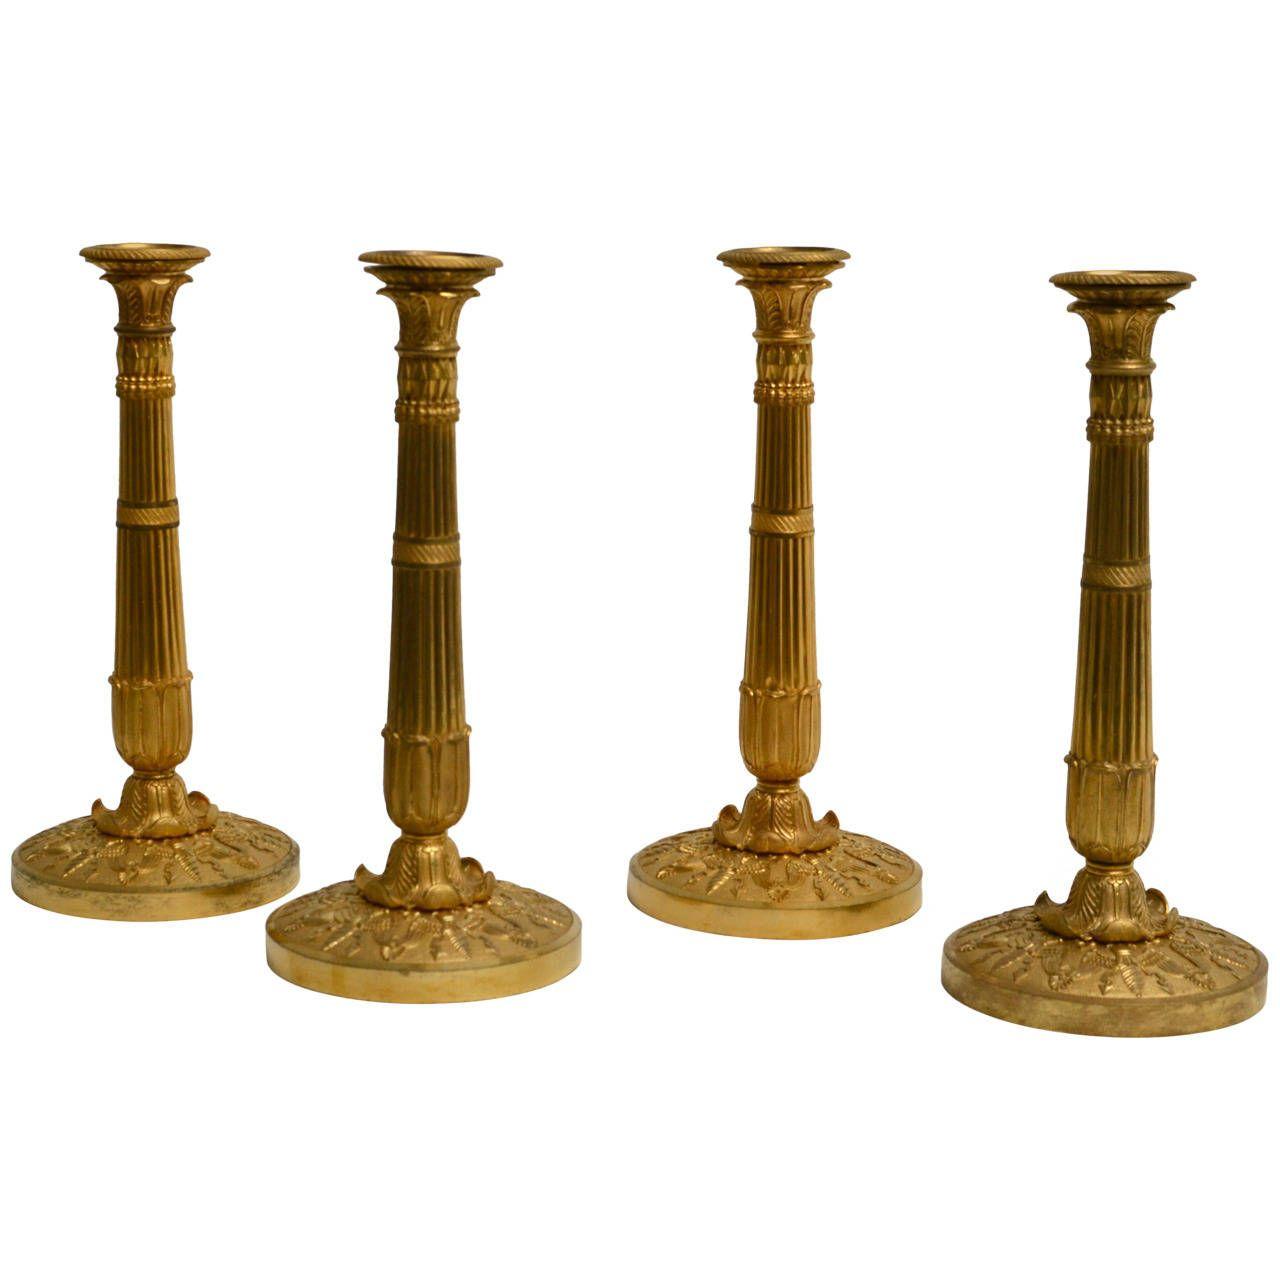 Rare Set of Four Large Gilt Bronze Candlesticks Attributed ...